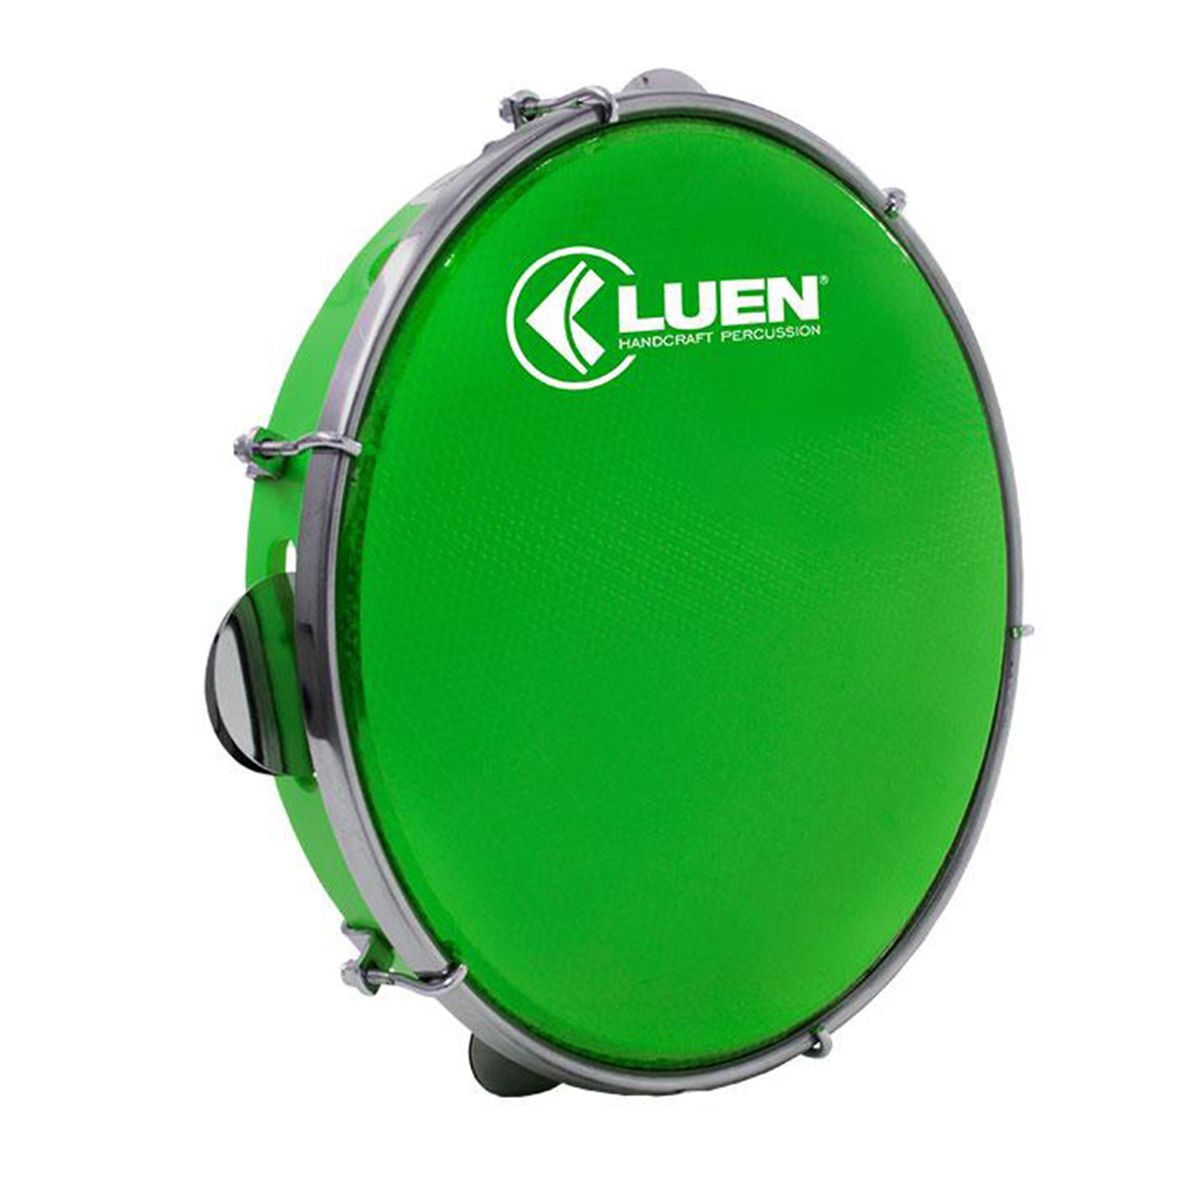 Pandeiro Luen Percussion 10 Aro ABS Pele Holográfica Verde